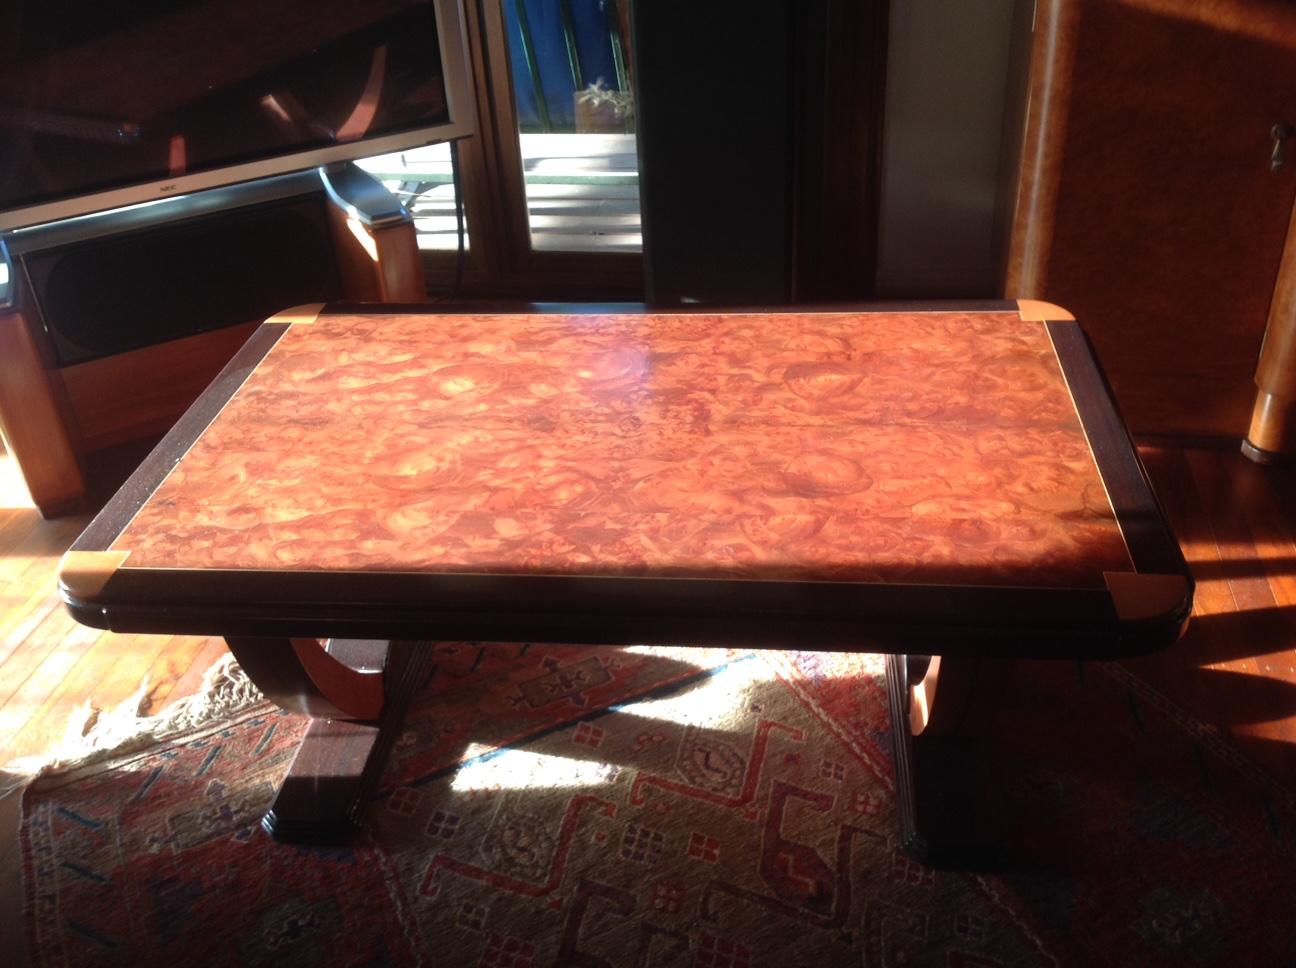 Triton stus shed deco coffee table made of wenge tasmanian myrtle and makore mahogany veneer greentooth Choice Image